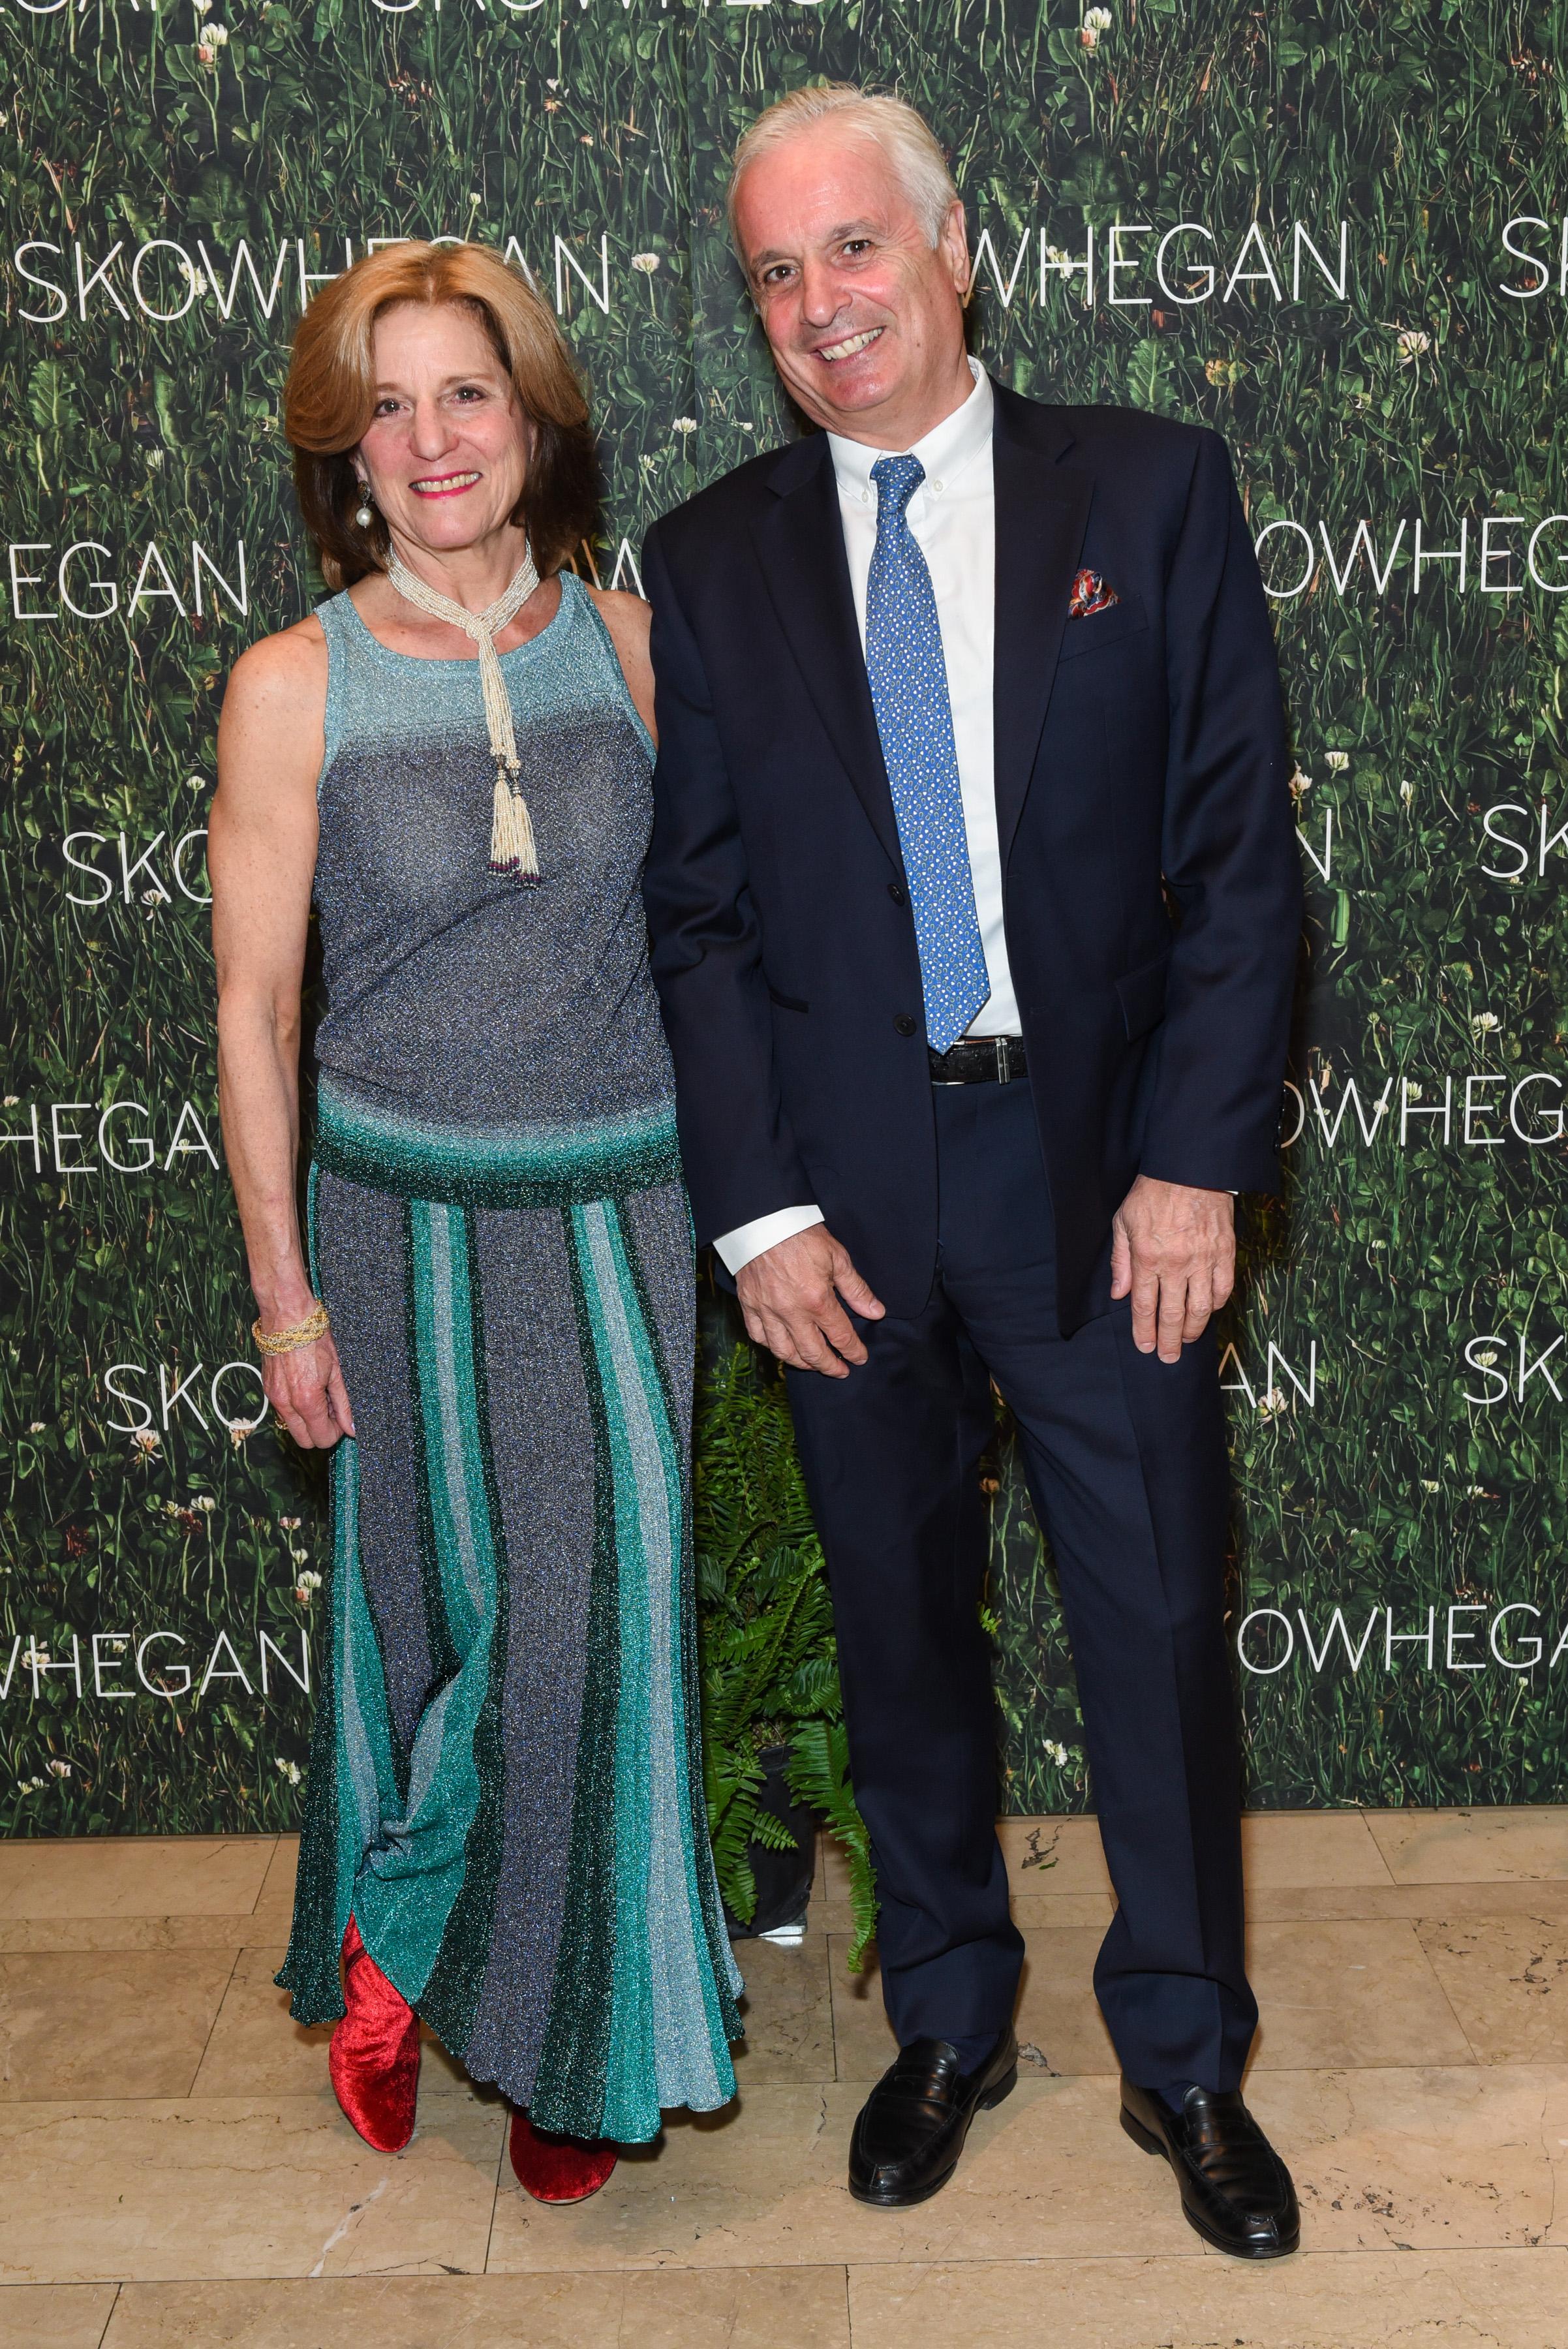 Jan Erison, Dominique Fons==Skowhegan Awards Dinner 2018==The Plaza Hotel, New York, NY==April 24, 2018==�Patrick McMullan==Photo - Presley Ann/PMC====